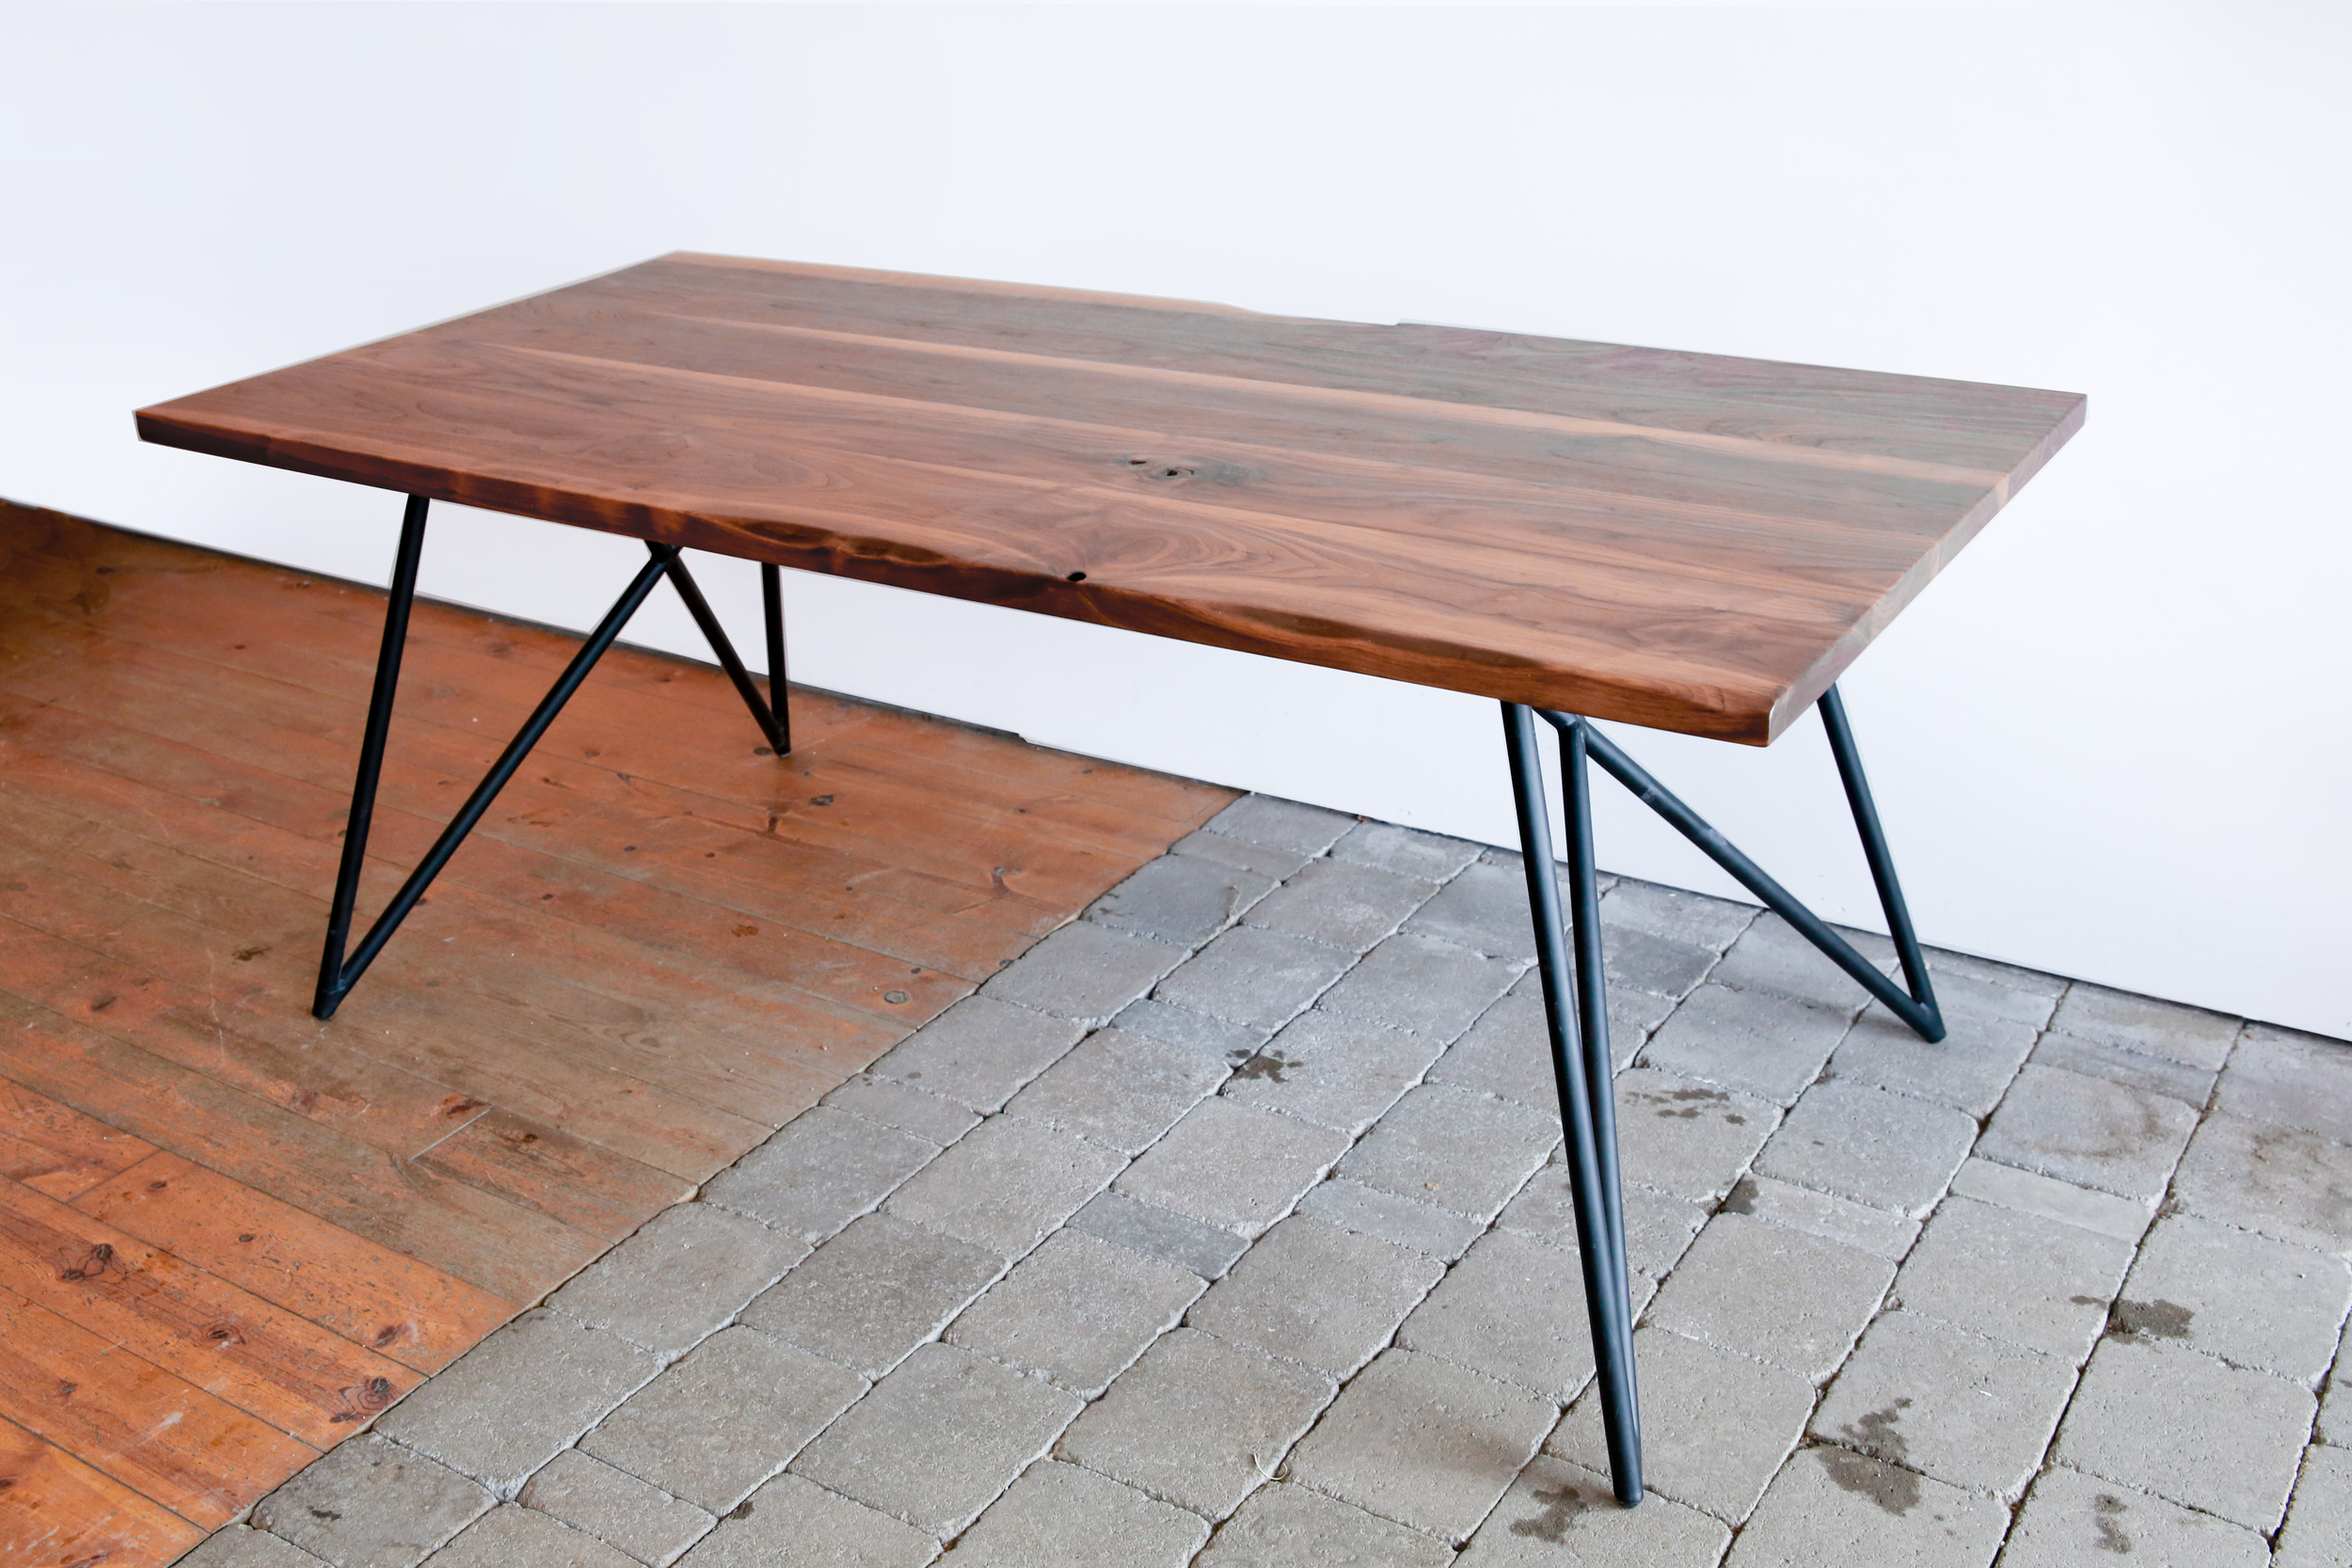 SLAB_table-2.jpg